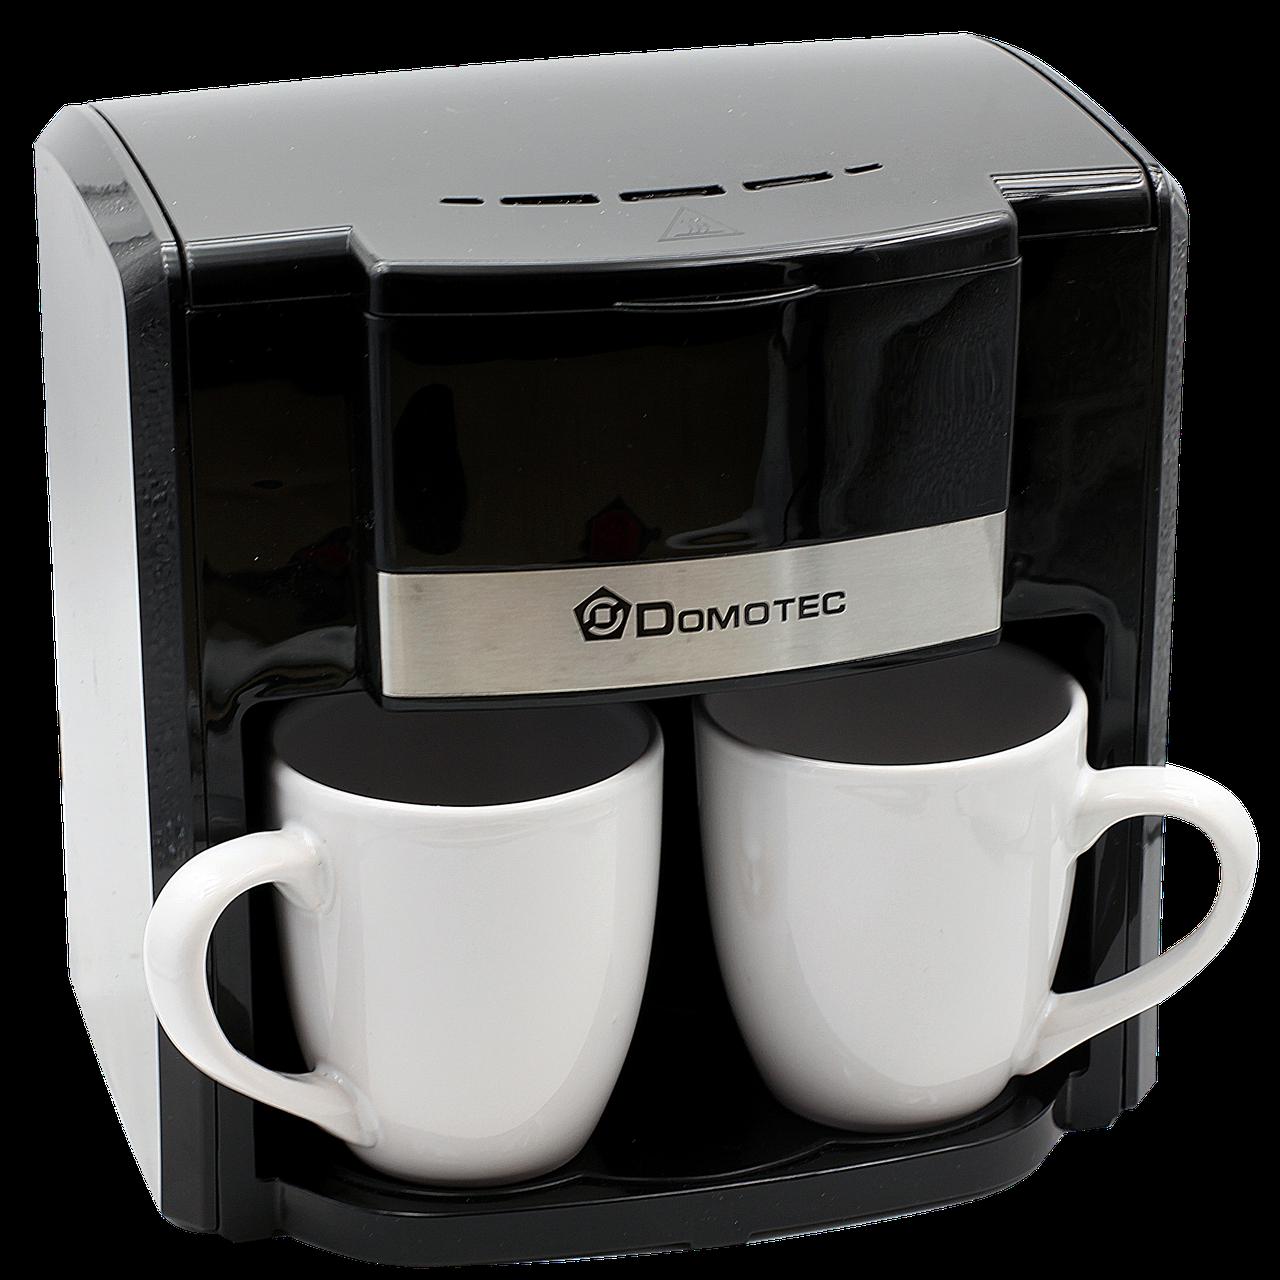 Кофеварка Domotec MS 0708 + 2 чашки 220V | кофемашина Домотек 500Вт 300мл